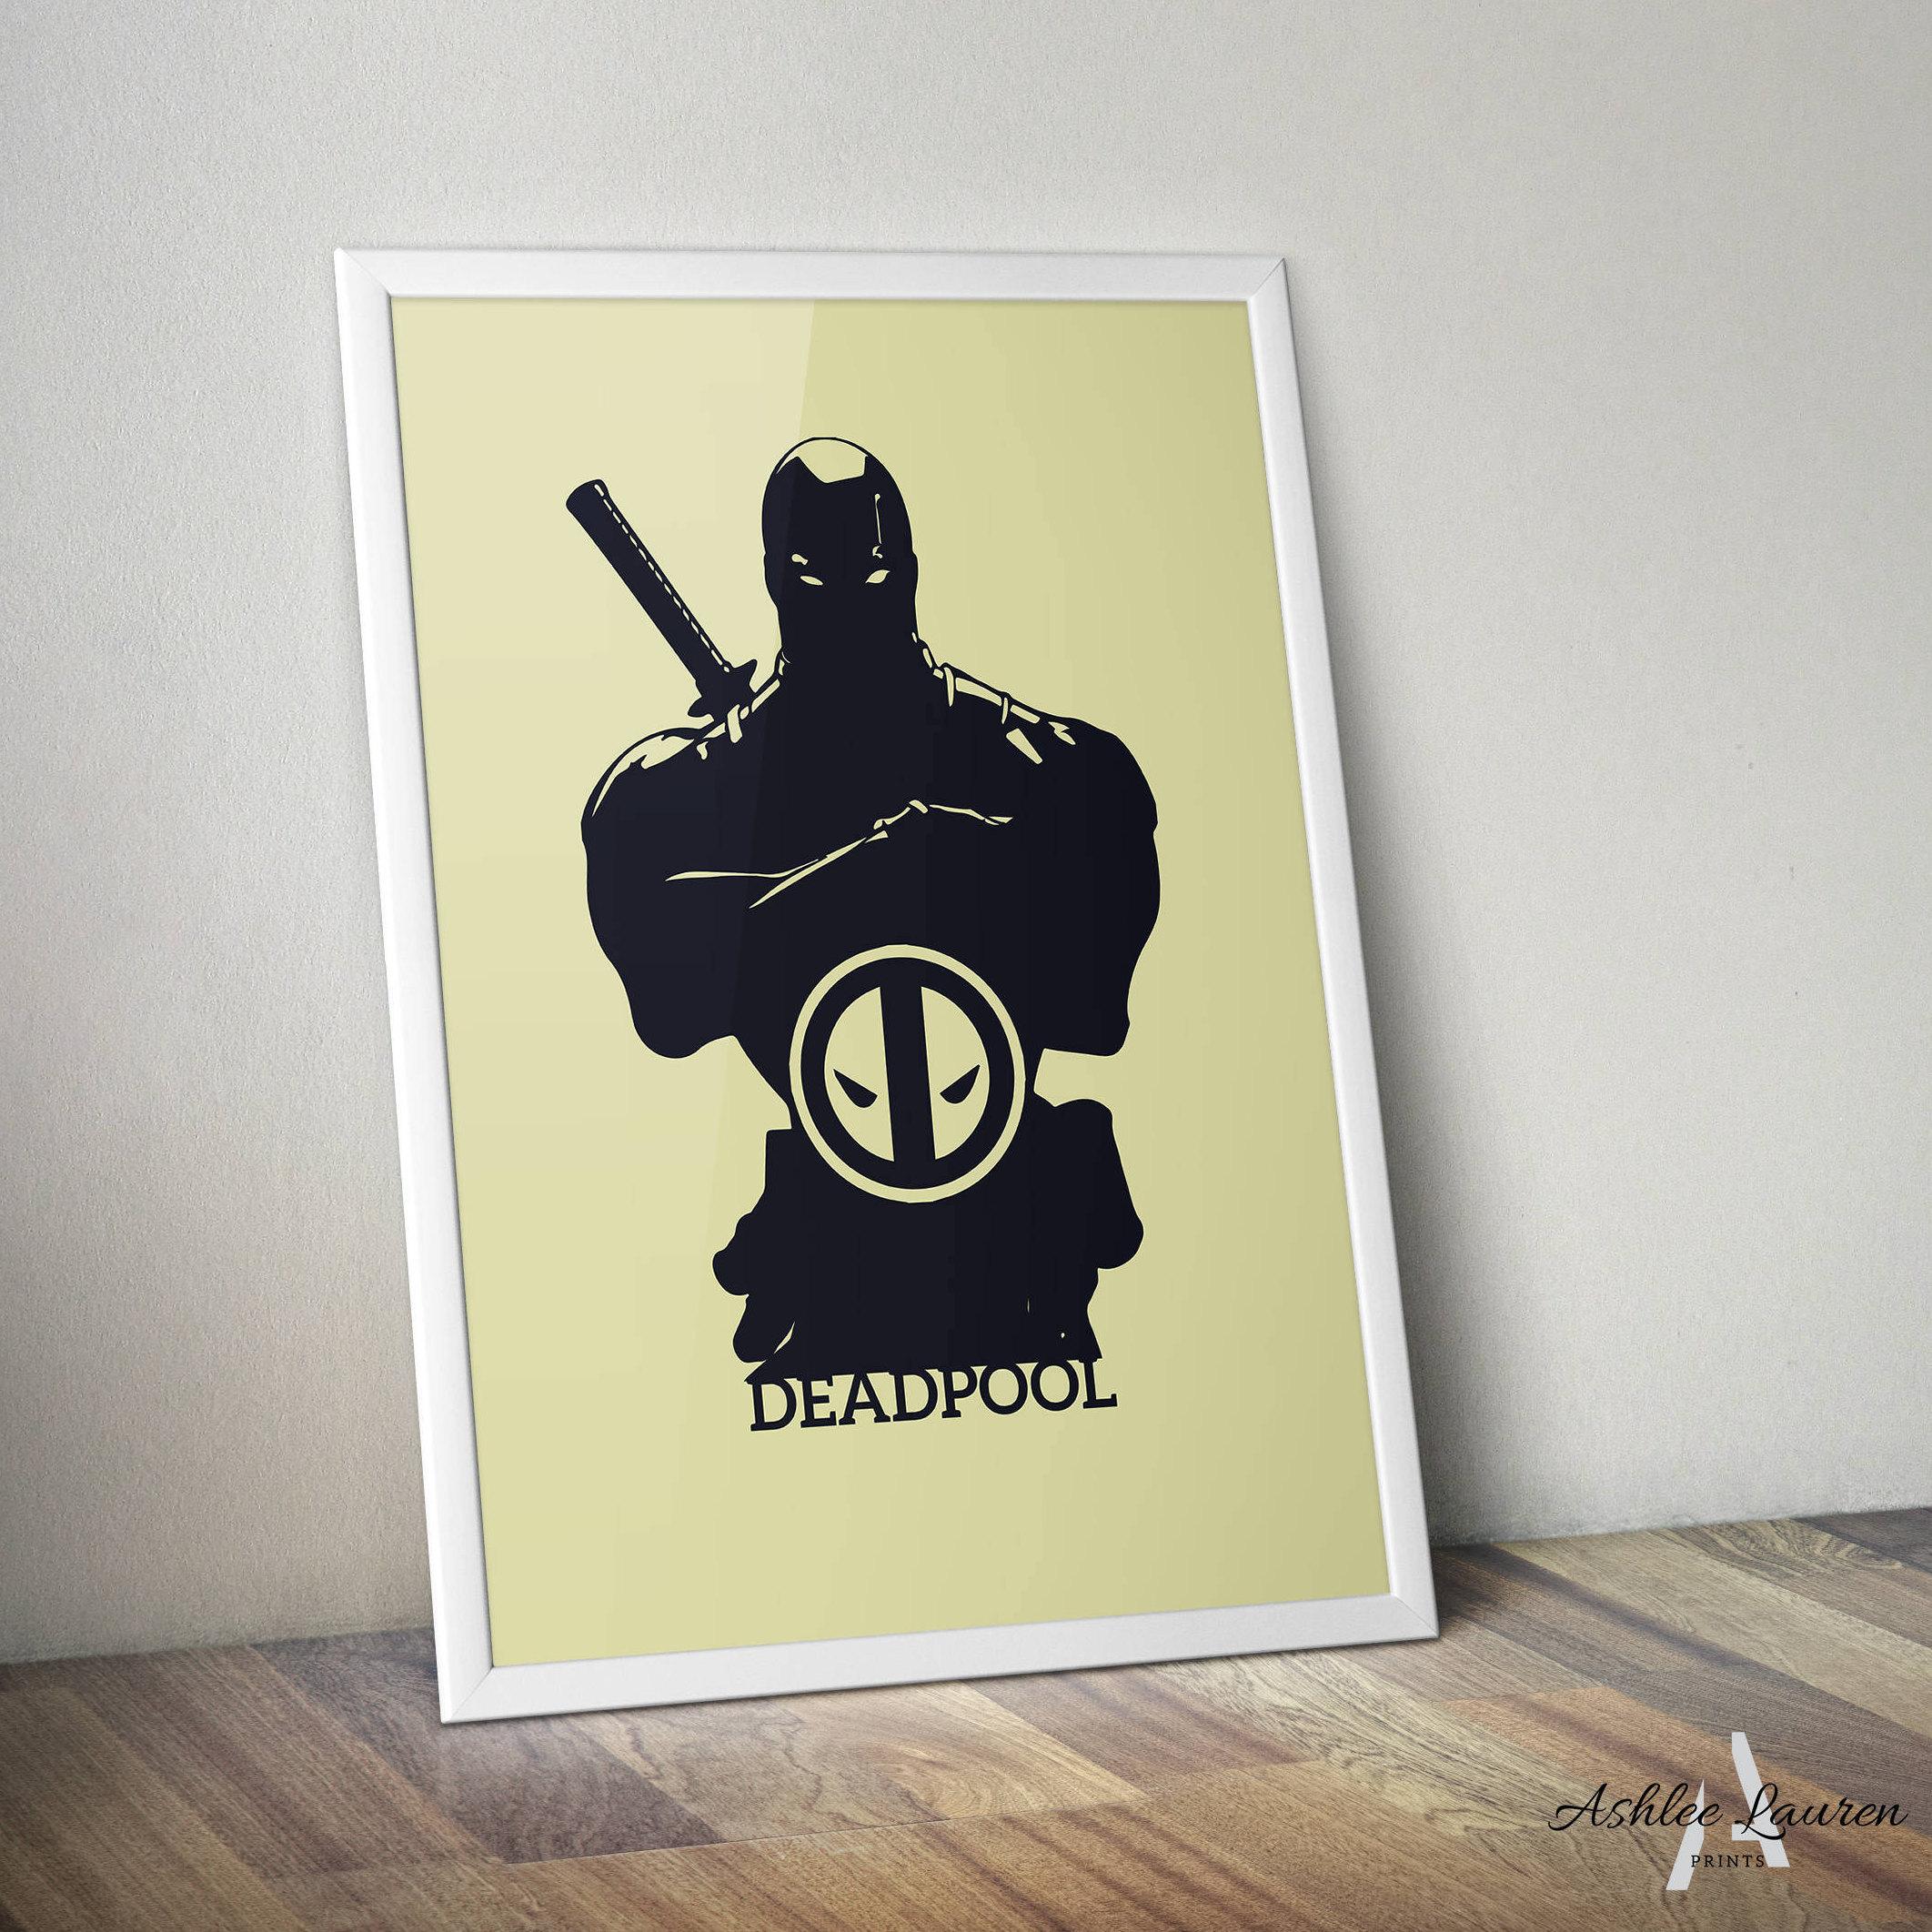 Deadpool Inspired Poster Print Digital Download Wall Art | Etsy